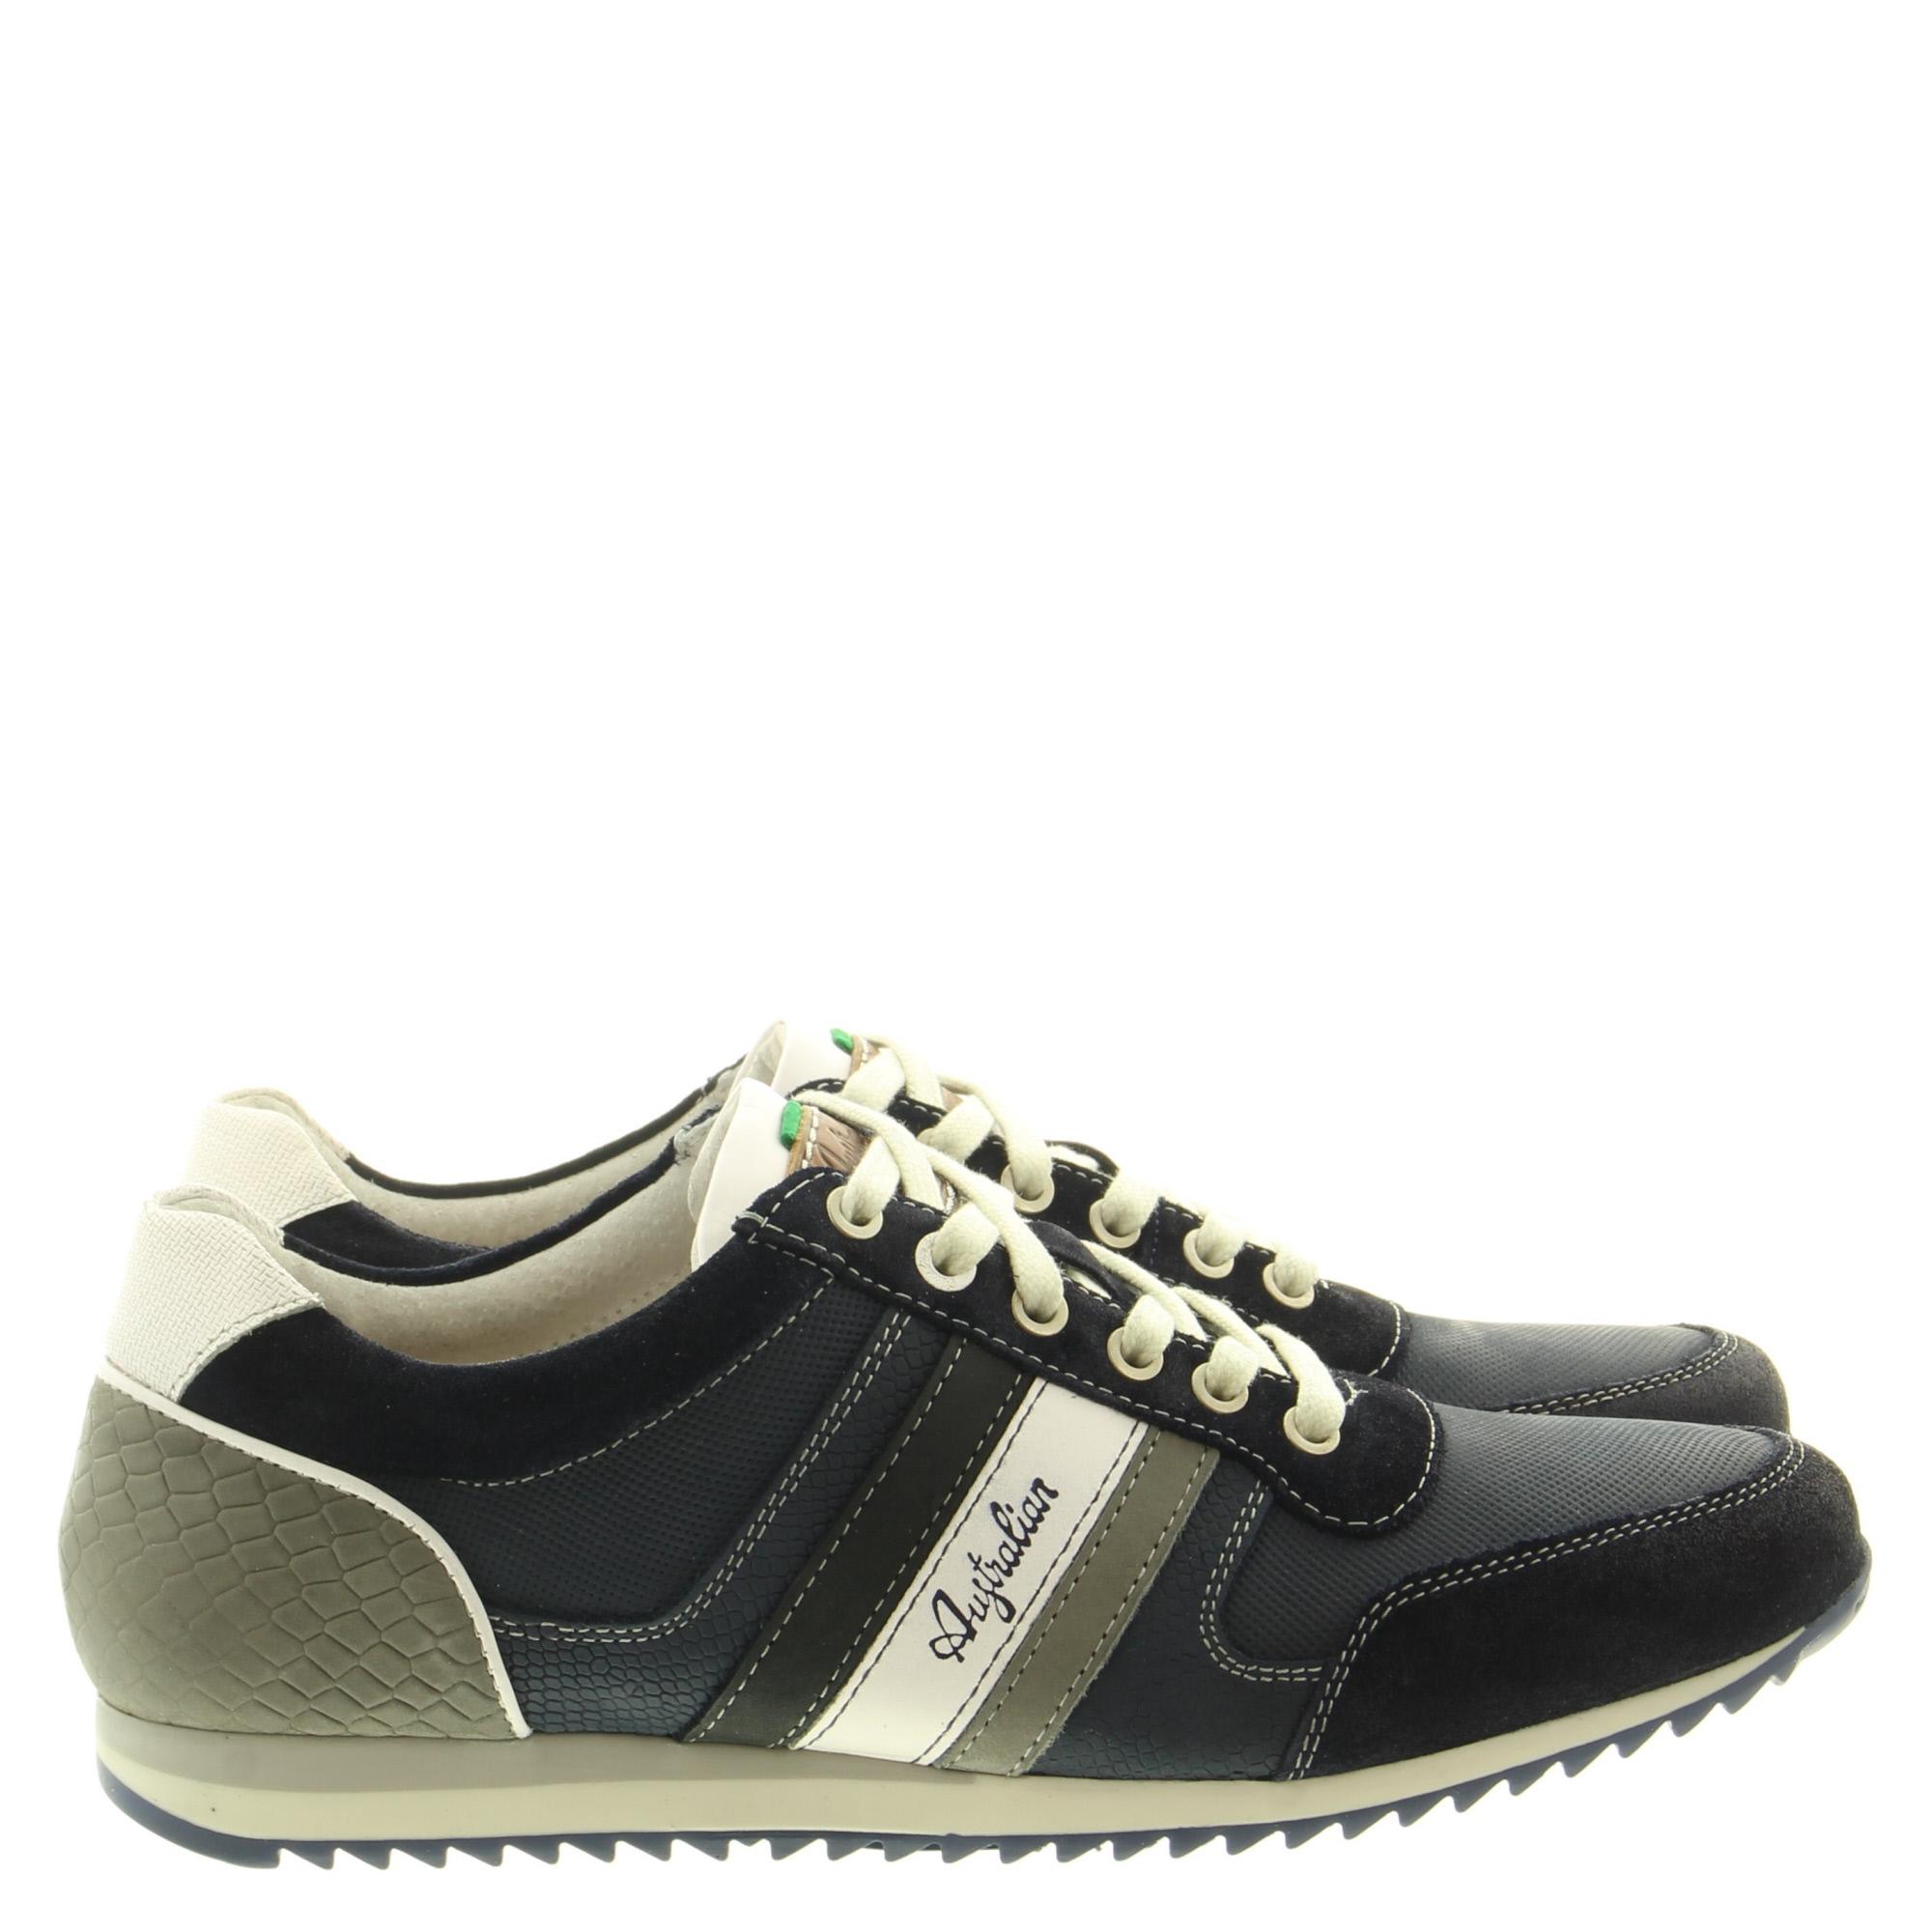 Australian Footwear Cornwall 15.1351.07 SI7 Blue-Grey-White